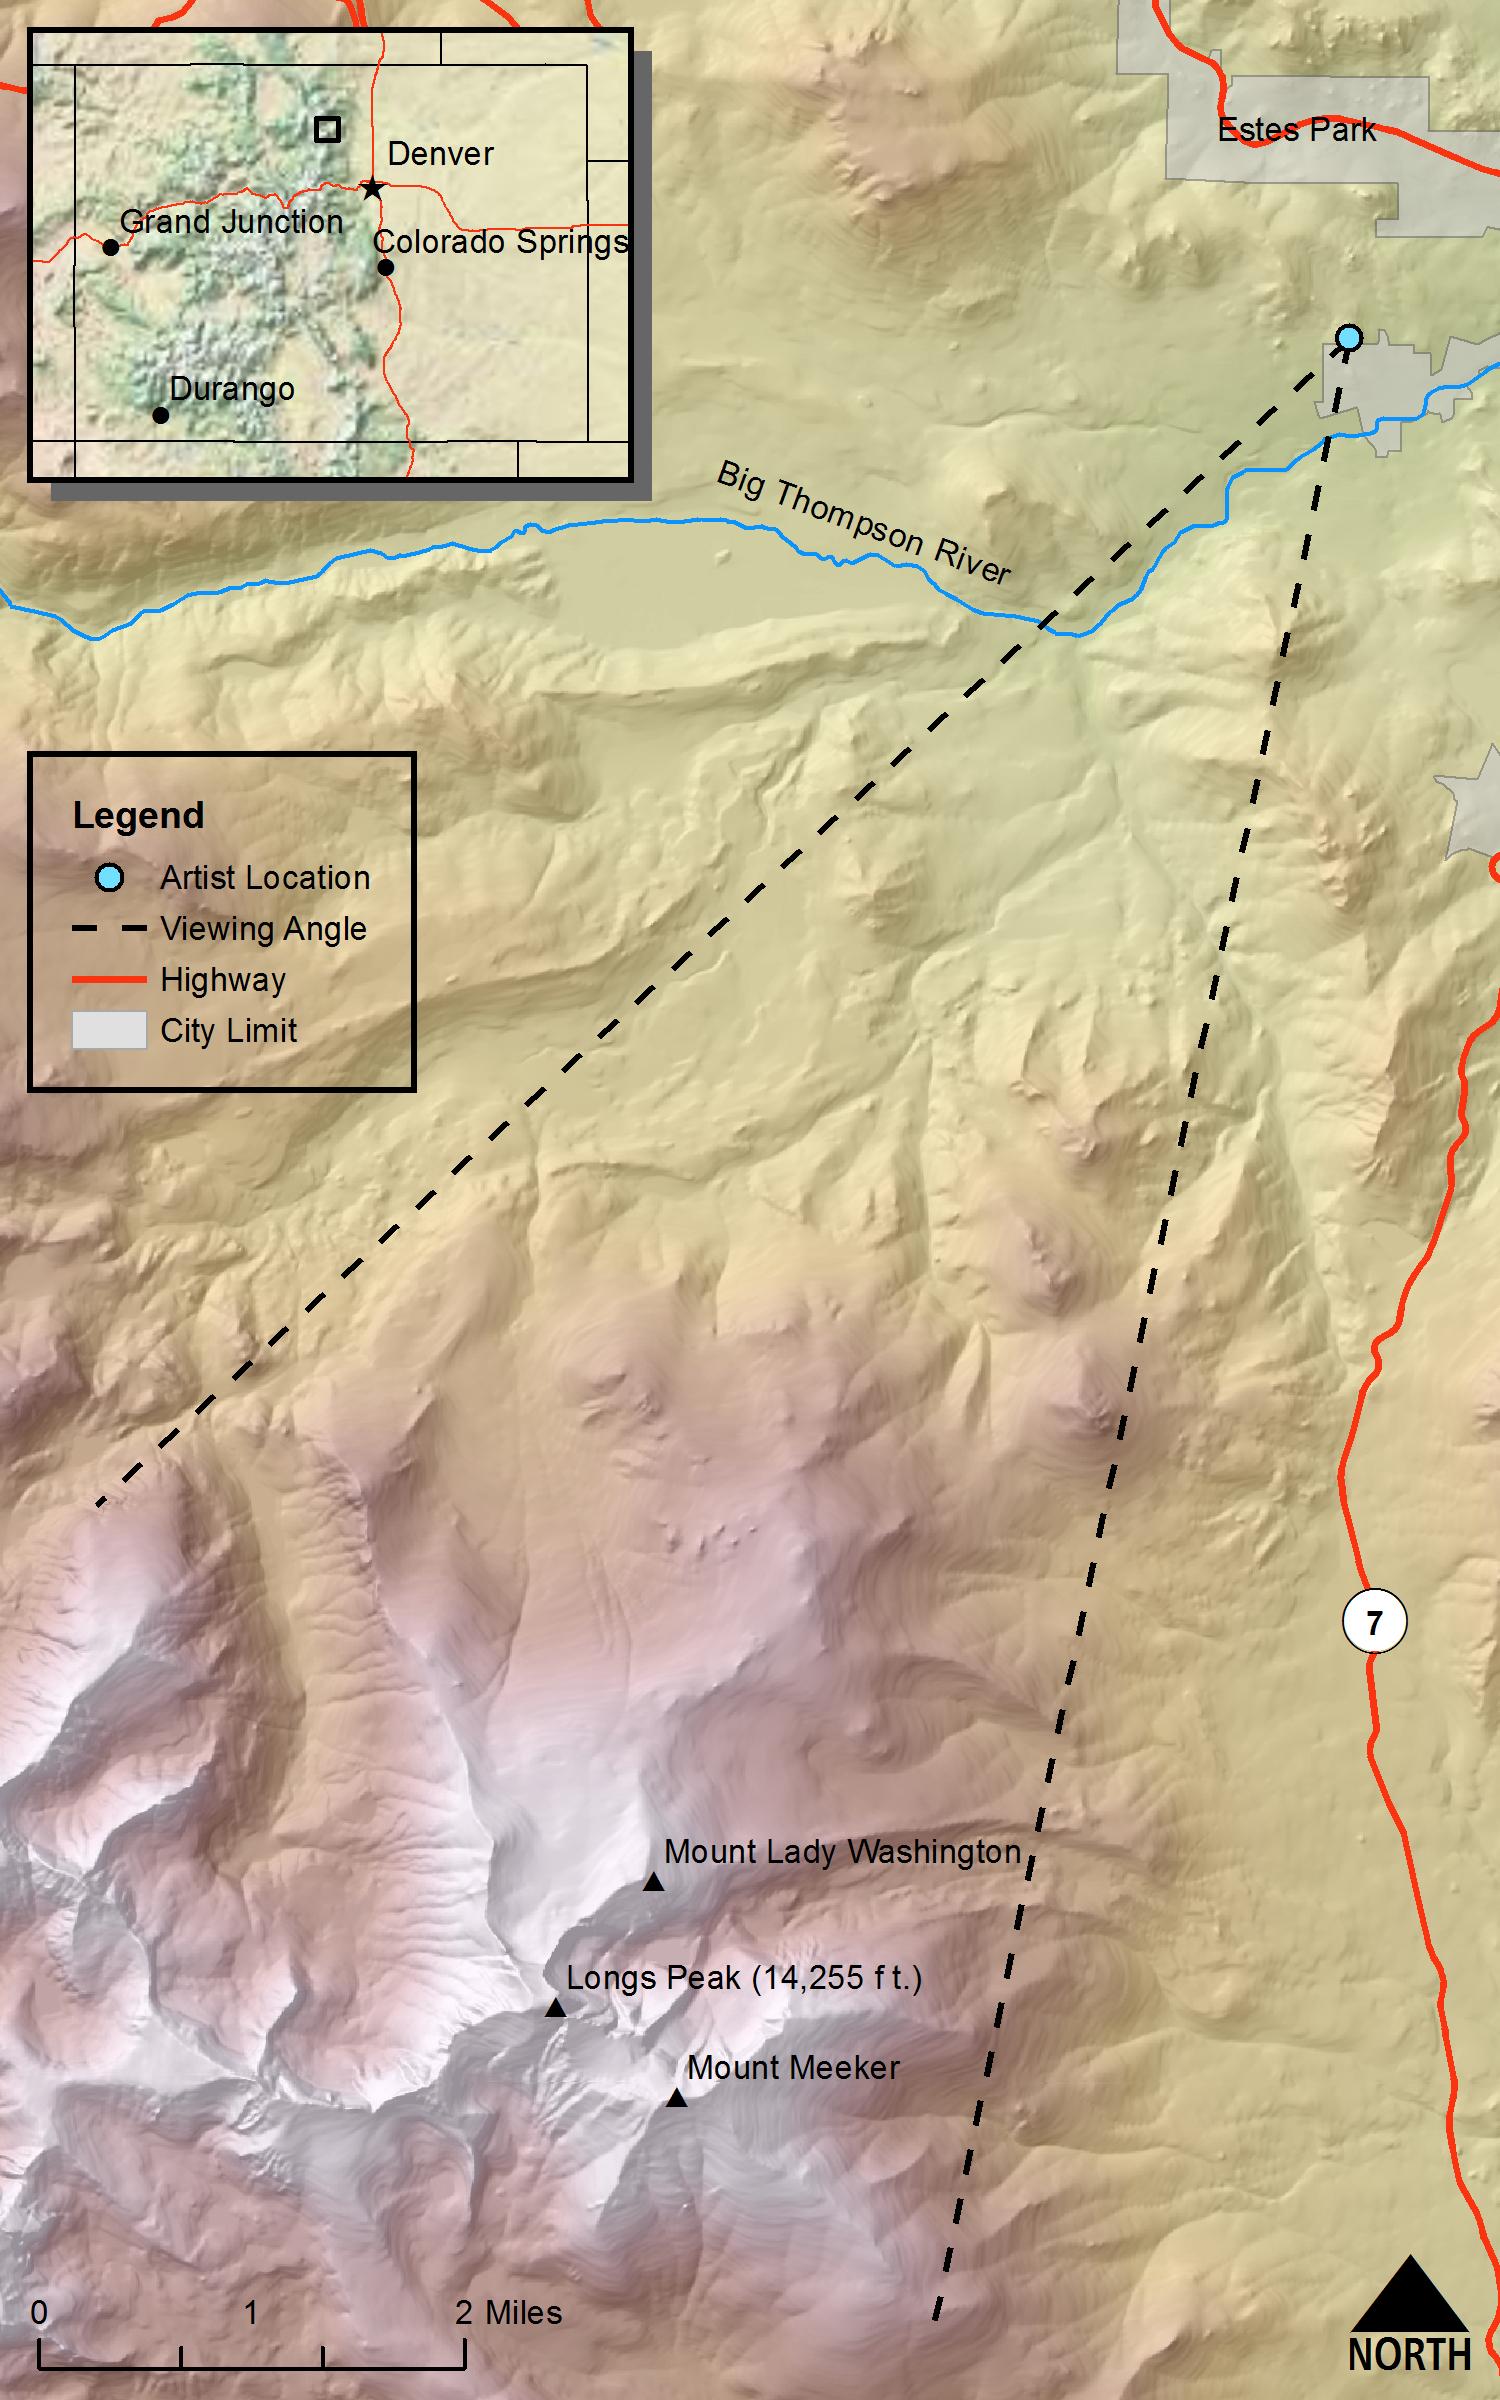 Hayden\'s Landscapes Revisited - Longs Peak/Exfoliation